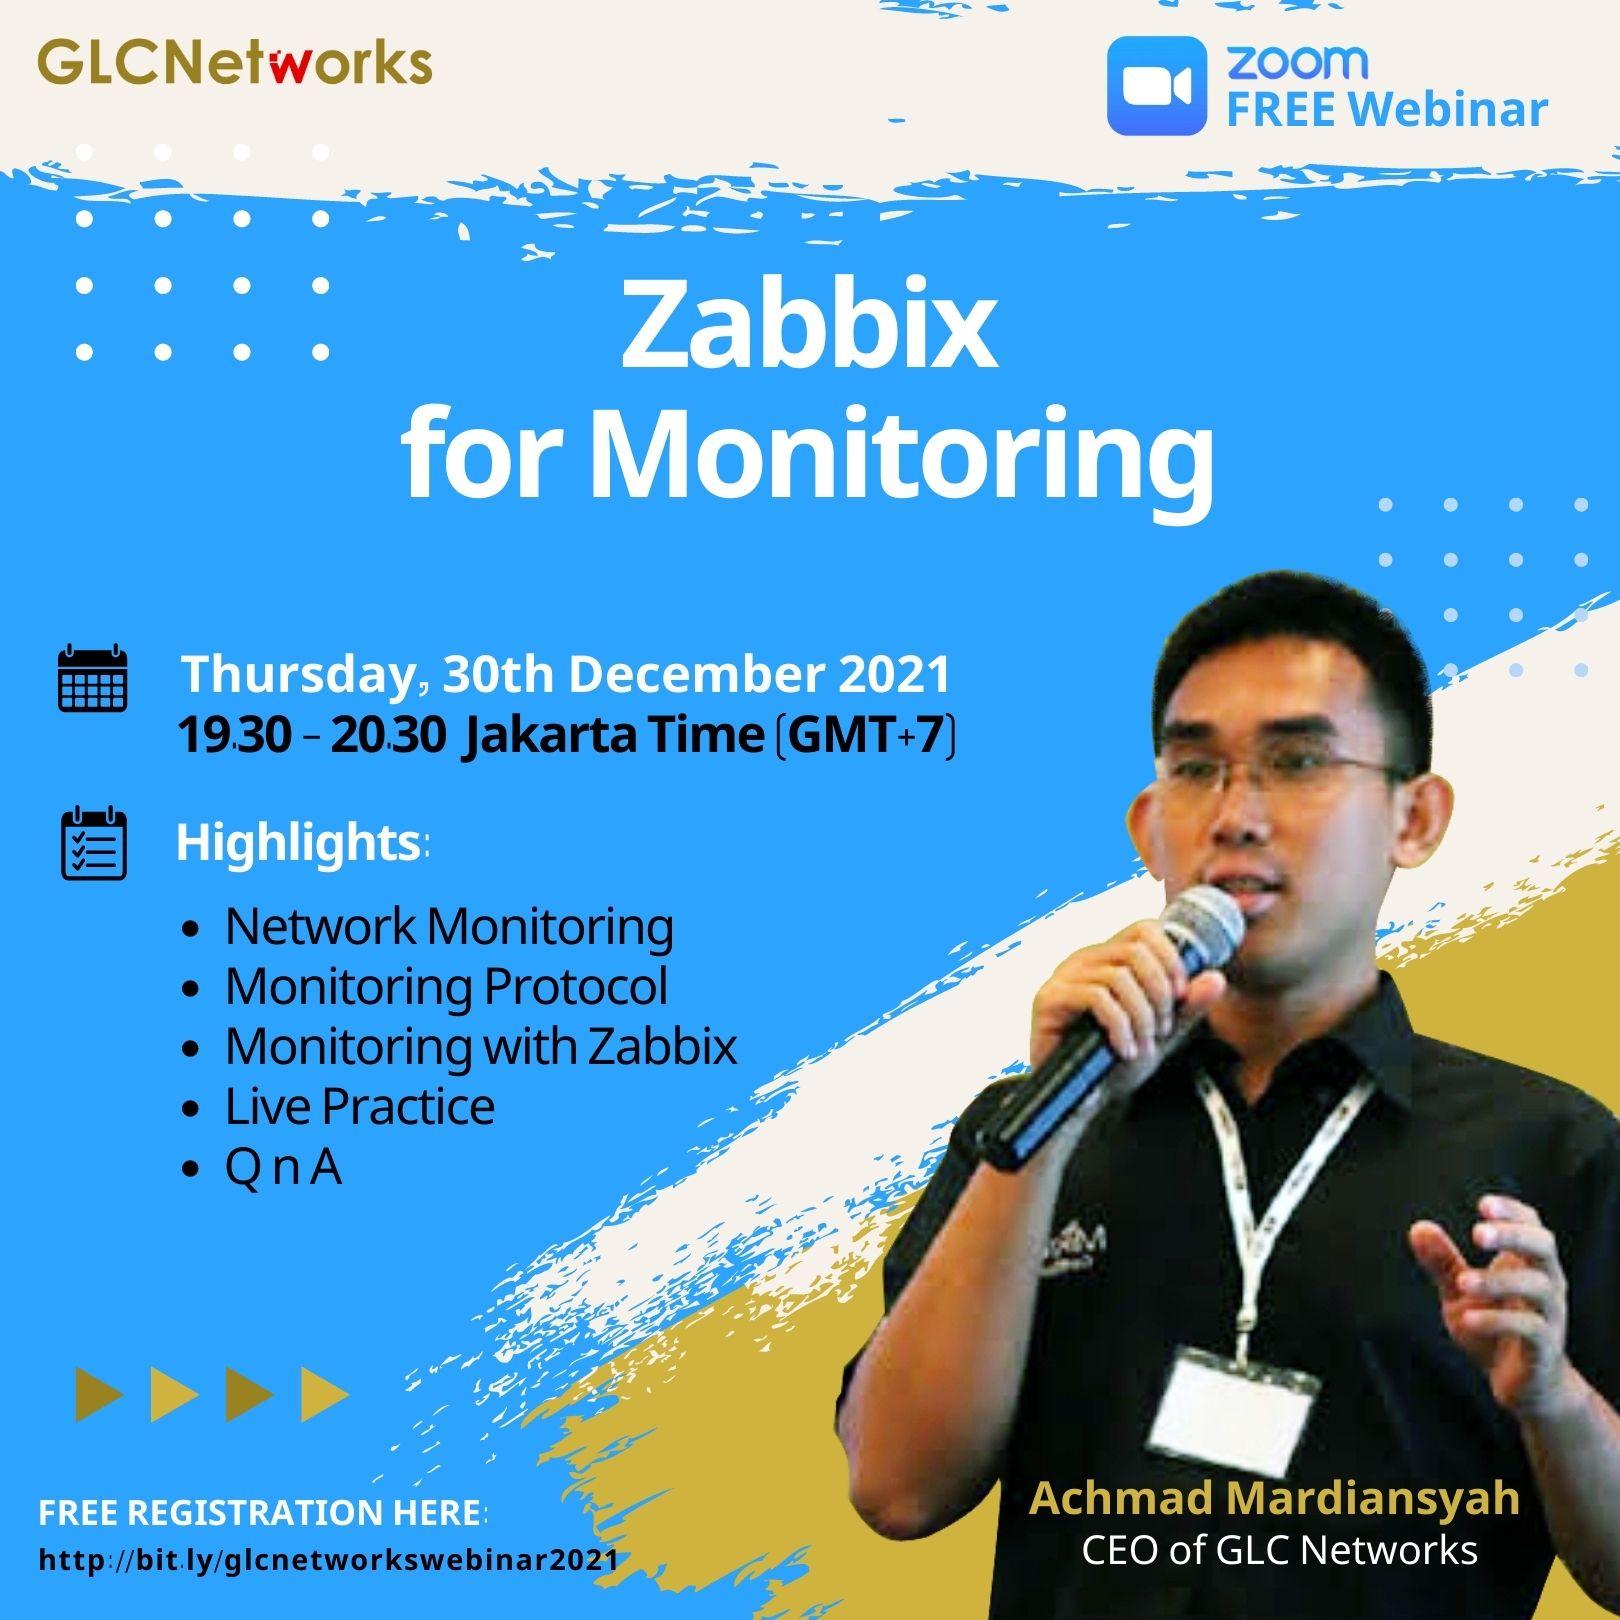 Zabbix for Monitoring